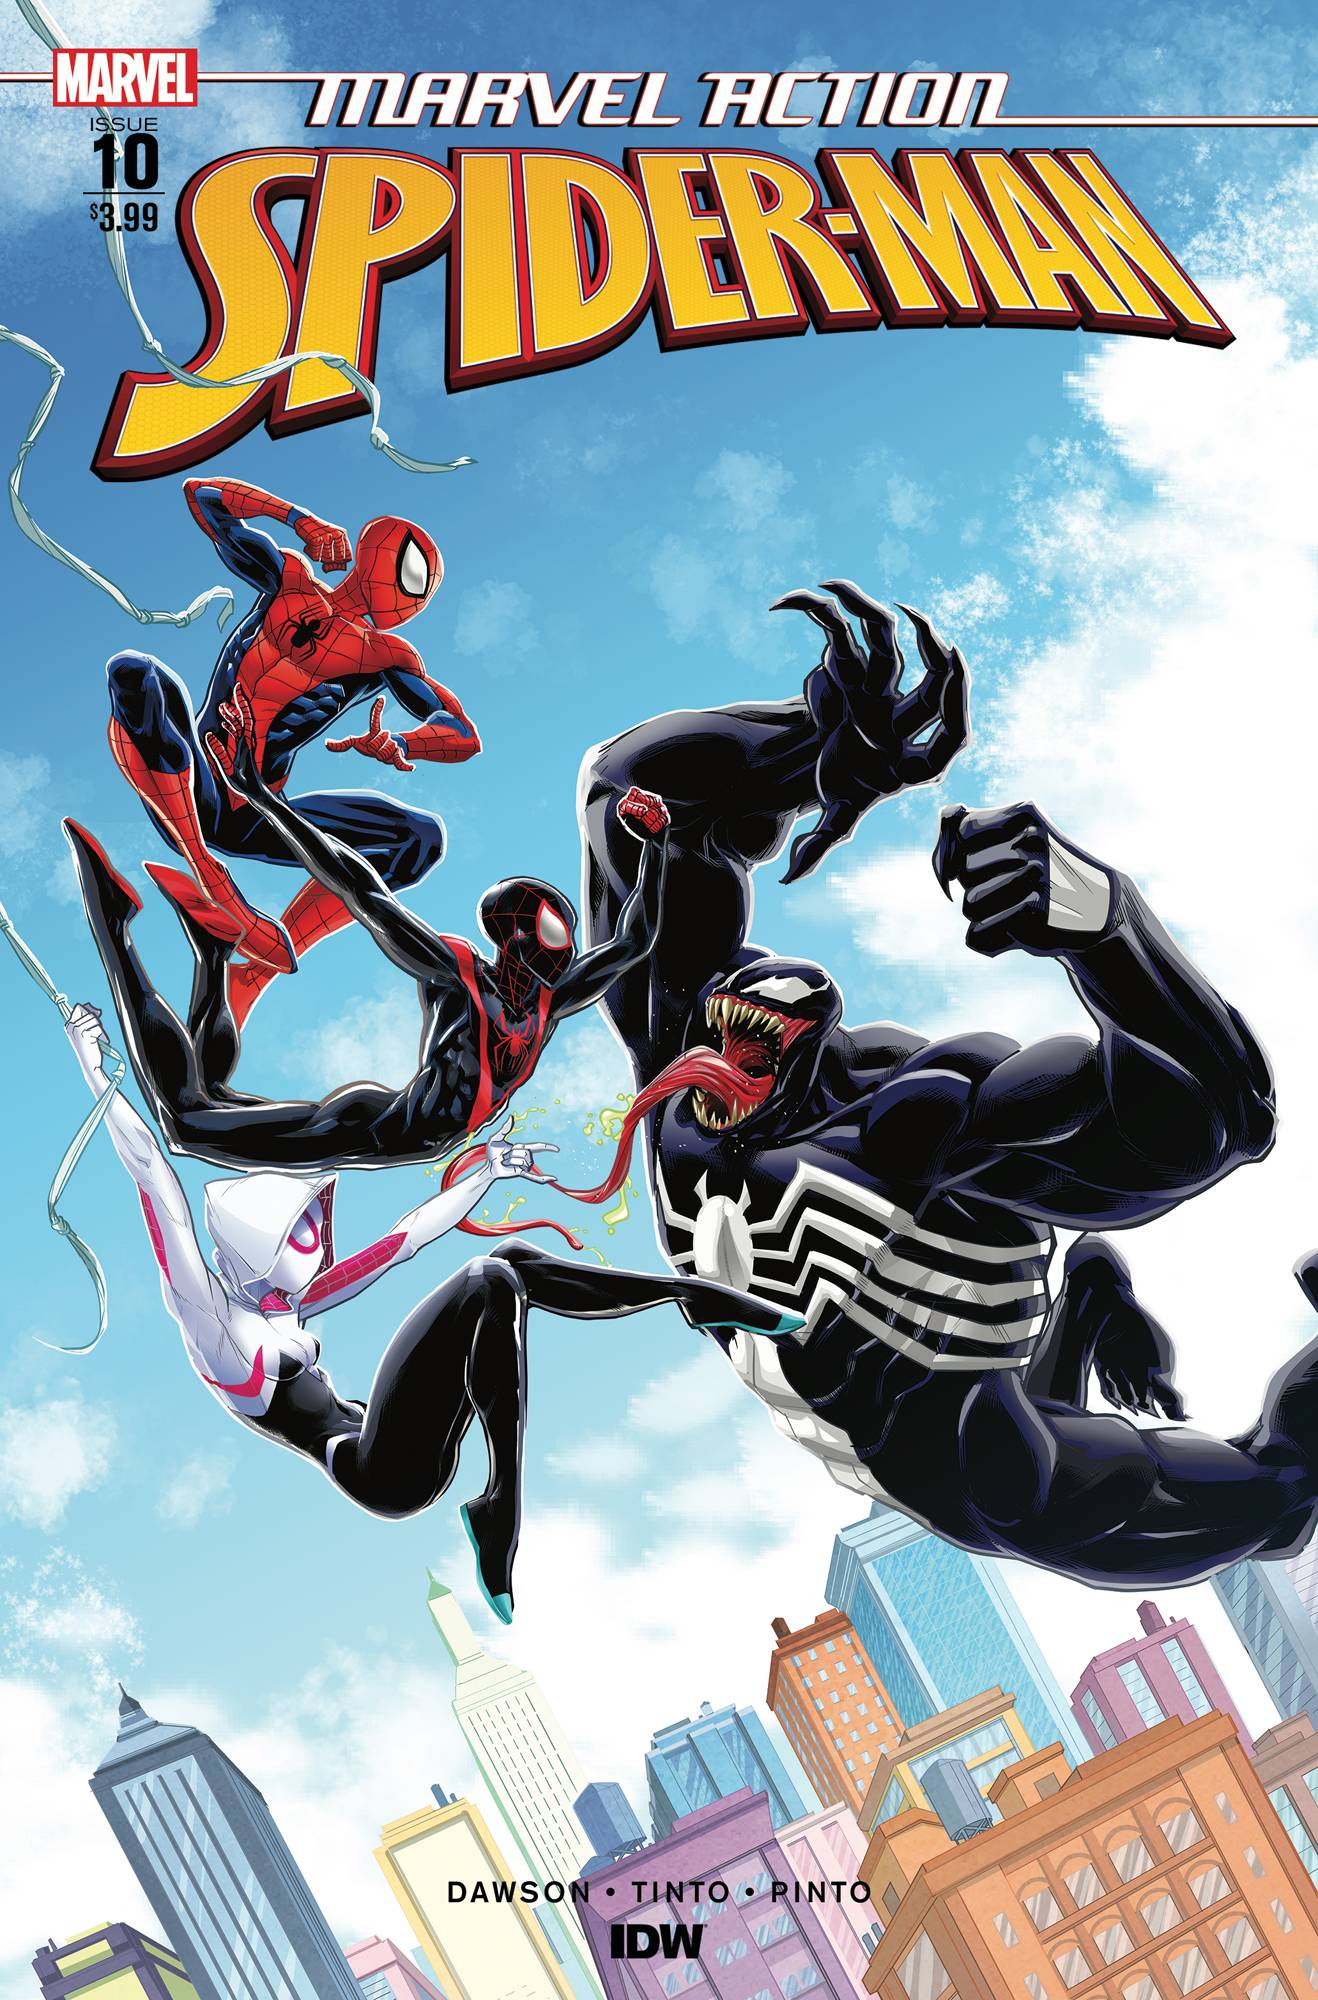 Marvel Action Spider-Man (IDW) #10 (2019)